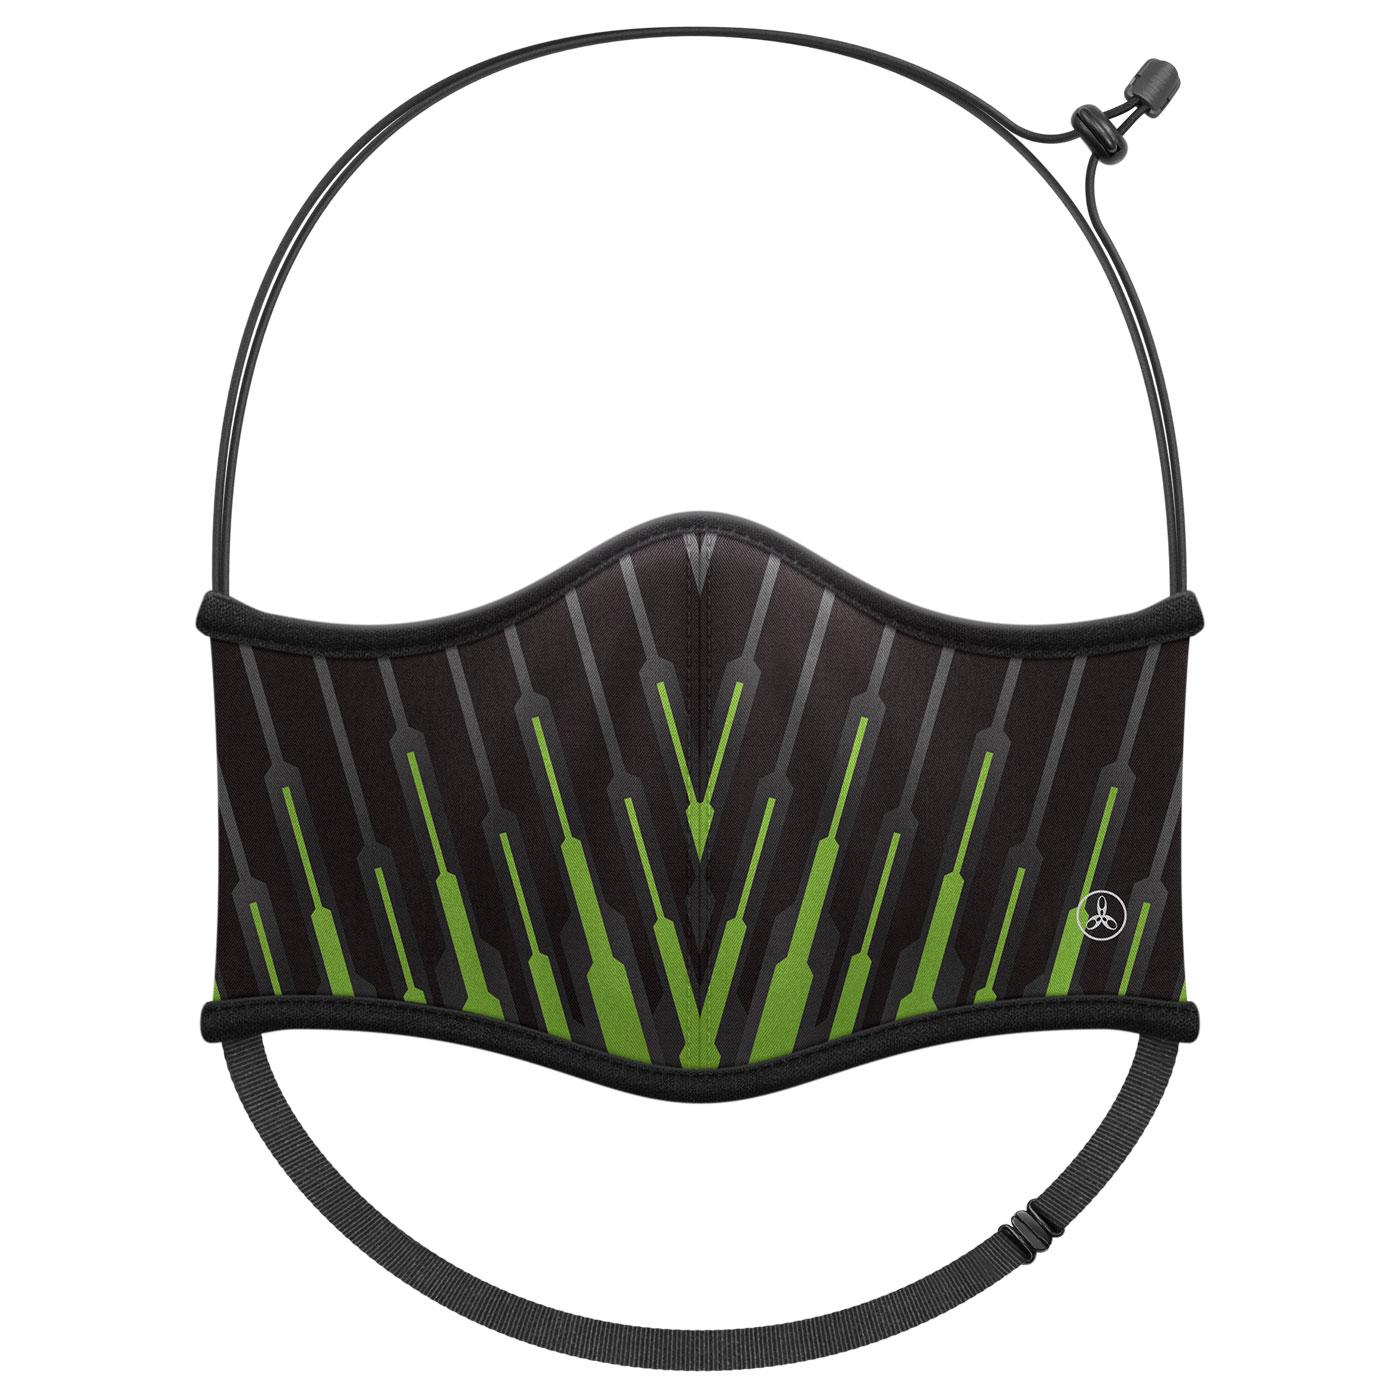 HODARLA 運動舒適口罩6032207 - 綠黑